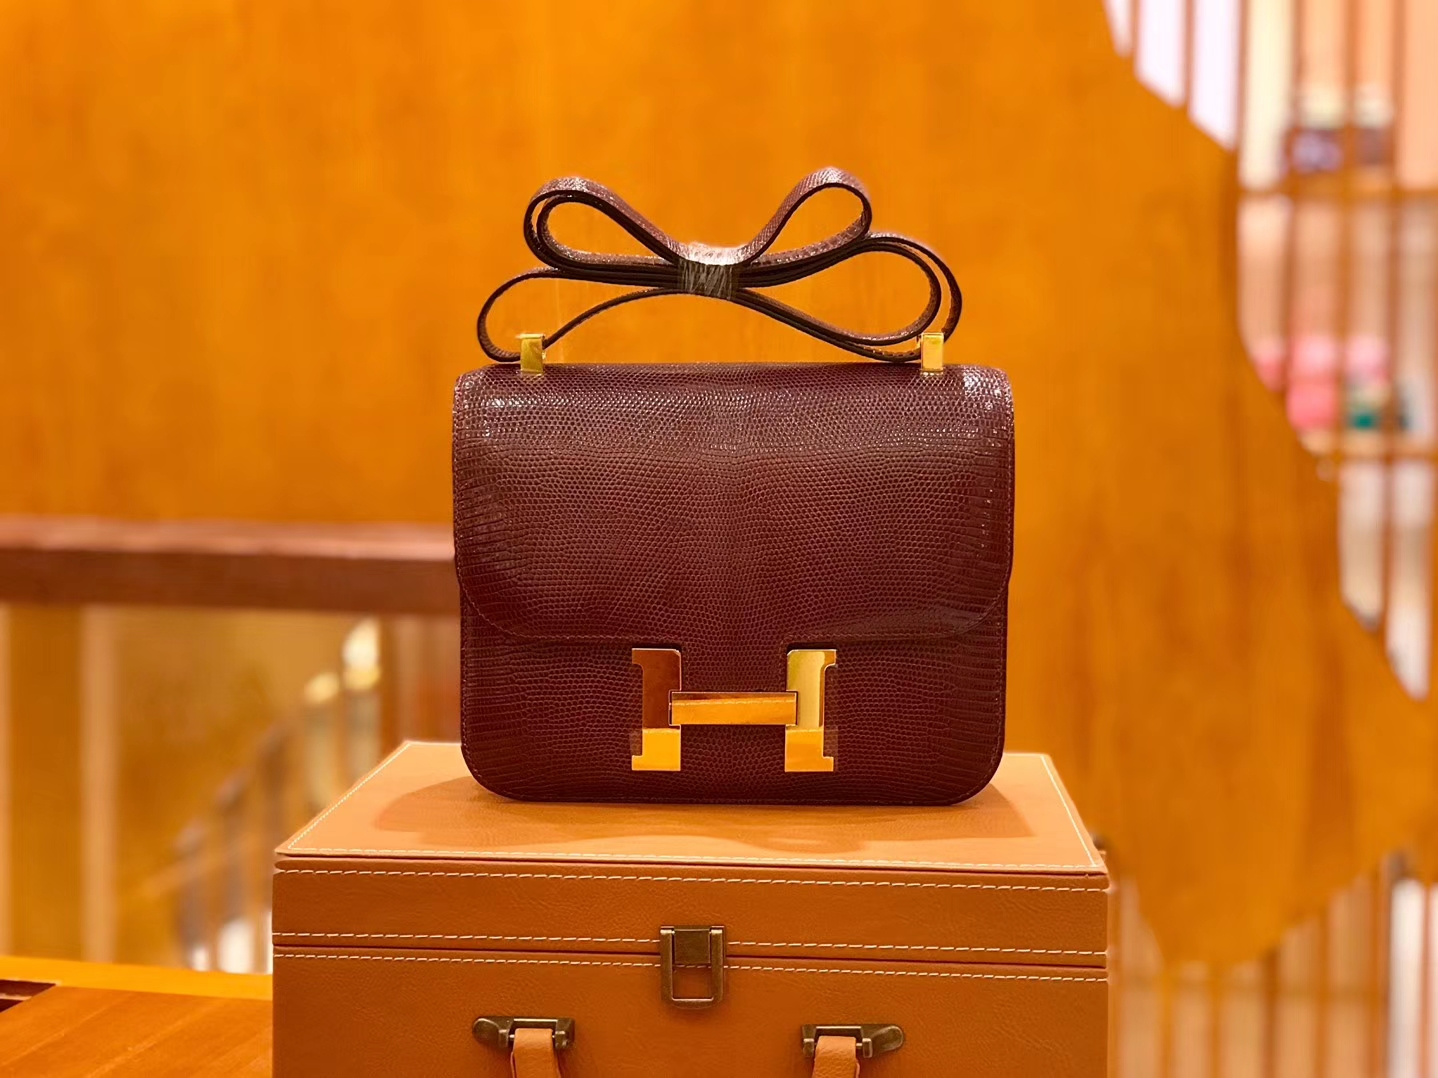 Hermès(爱马仕)Constance 空姐包 蜥蜴皮 酒红色 18cm